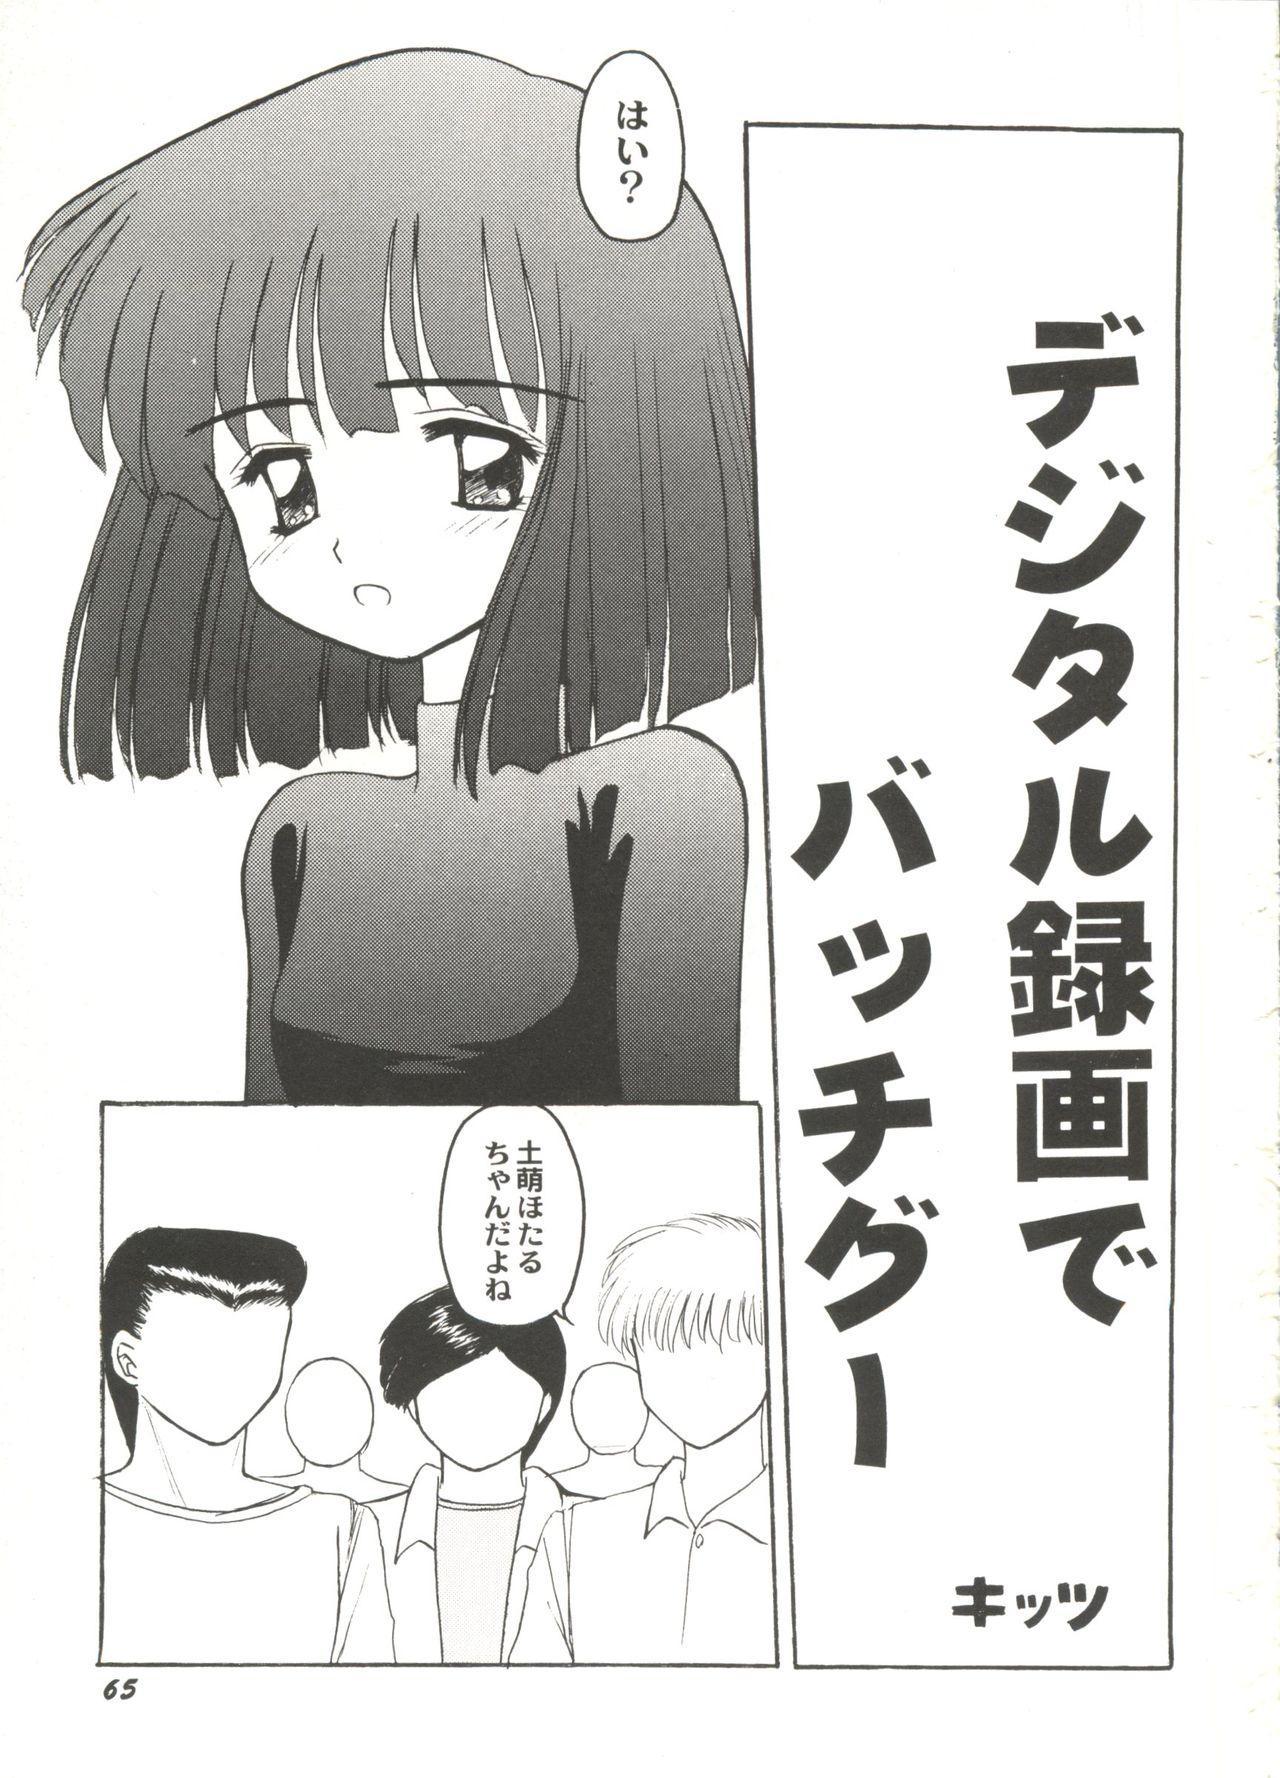 Bishoujo Doujin Peach Club - Pretty Gal's Fanzine Peach Club 9 66